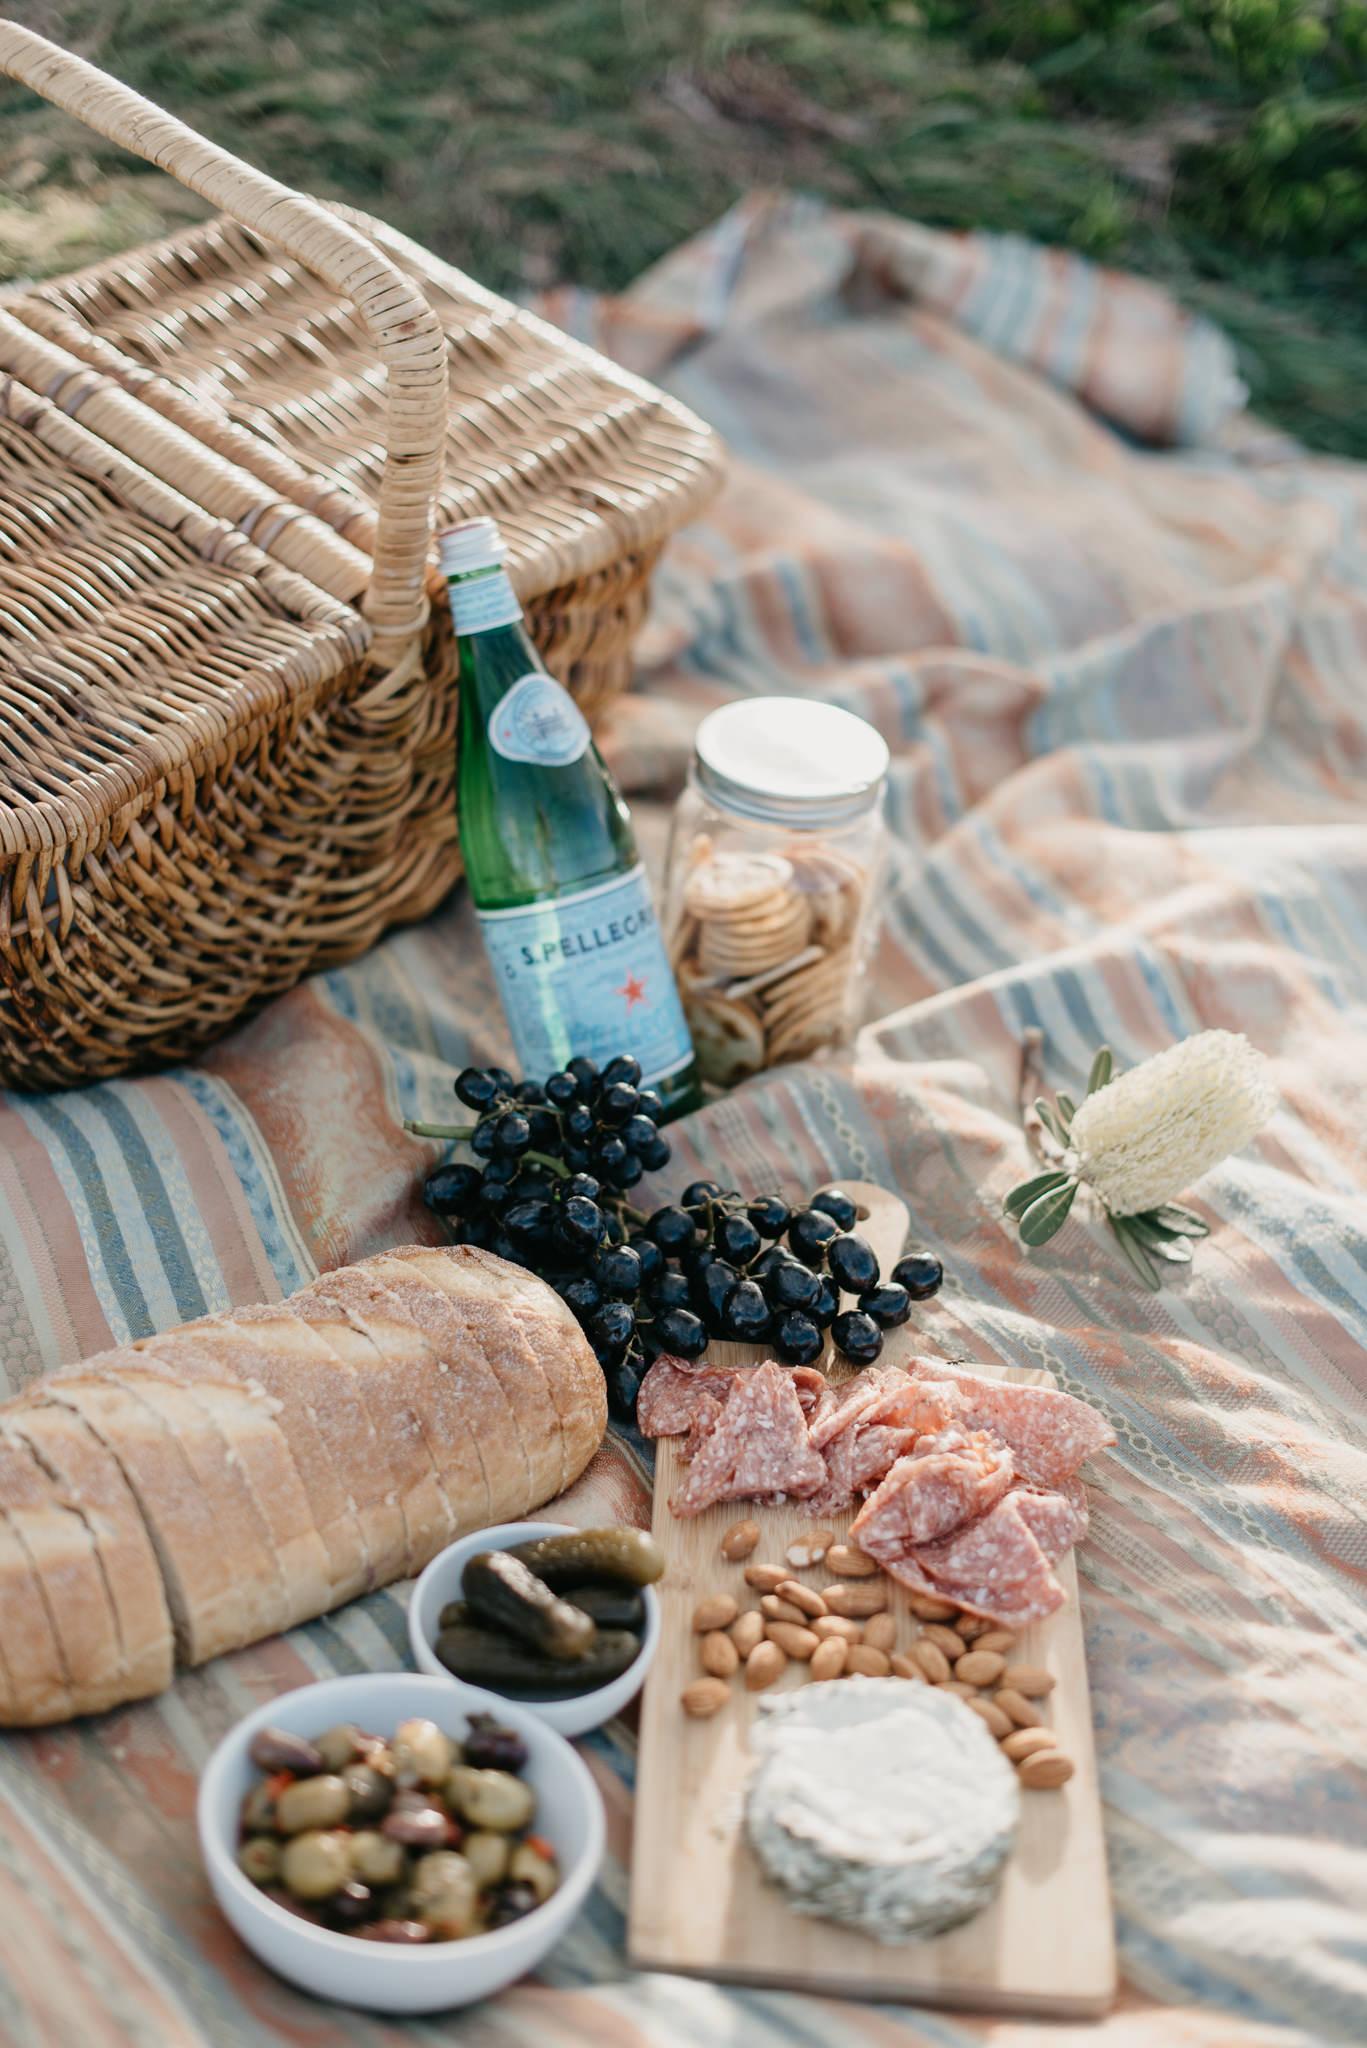 180408 - noosa picnic-4.jpg